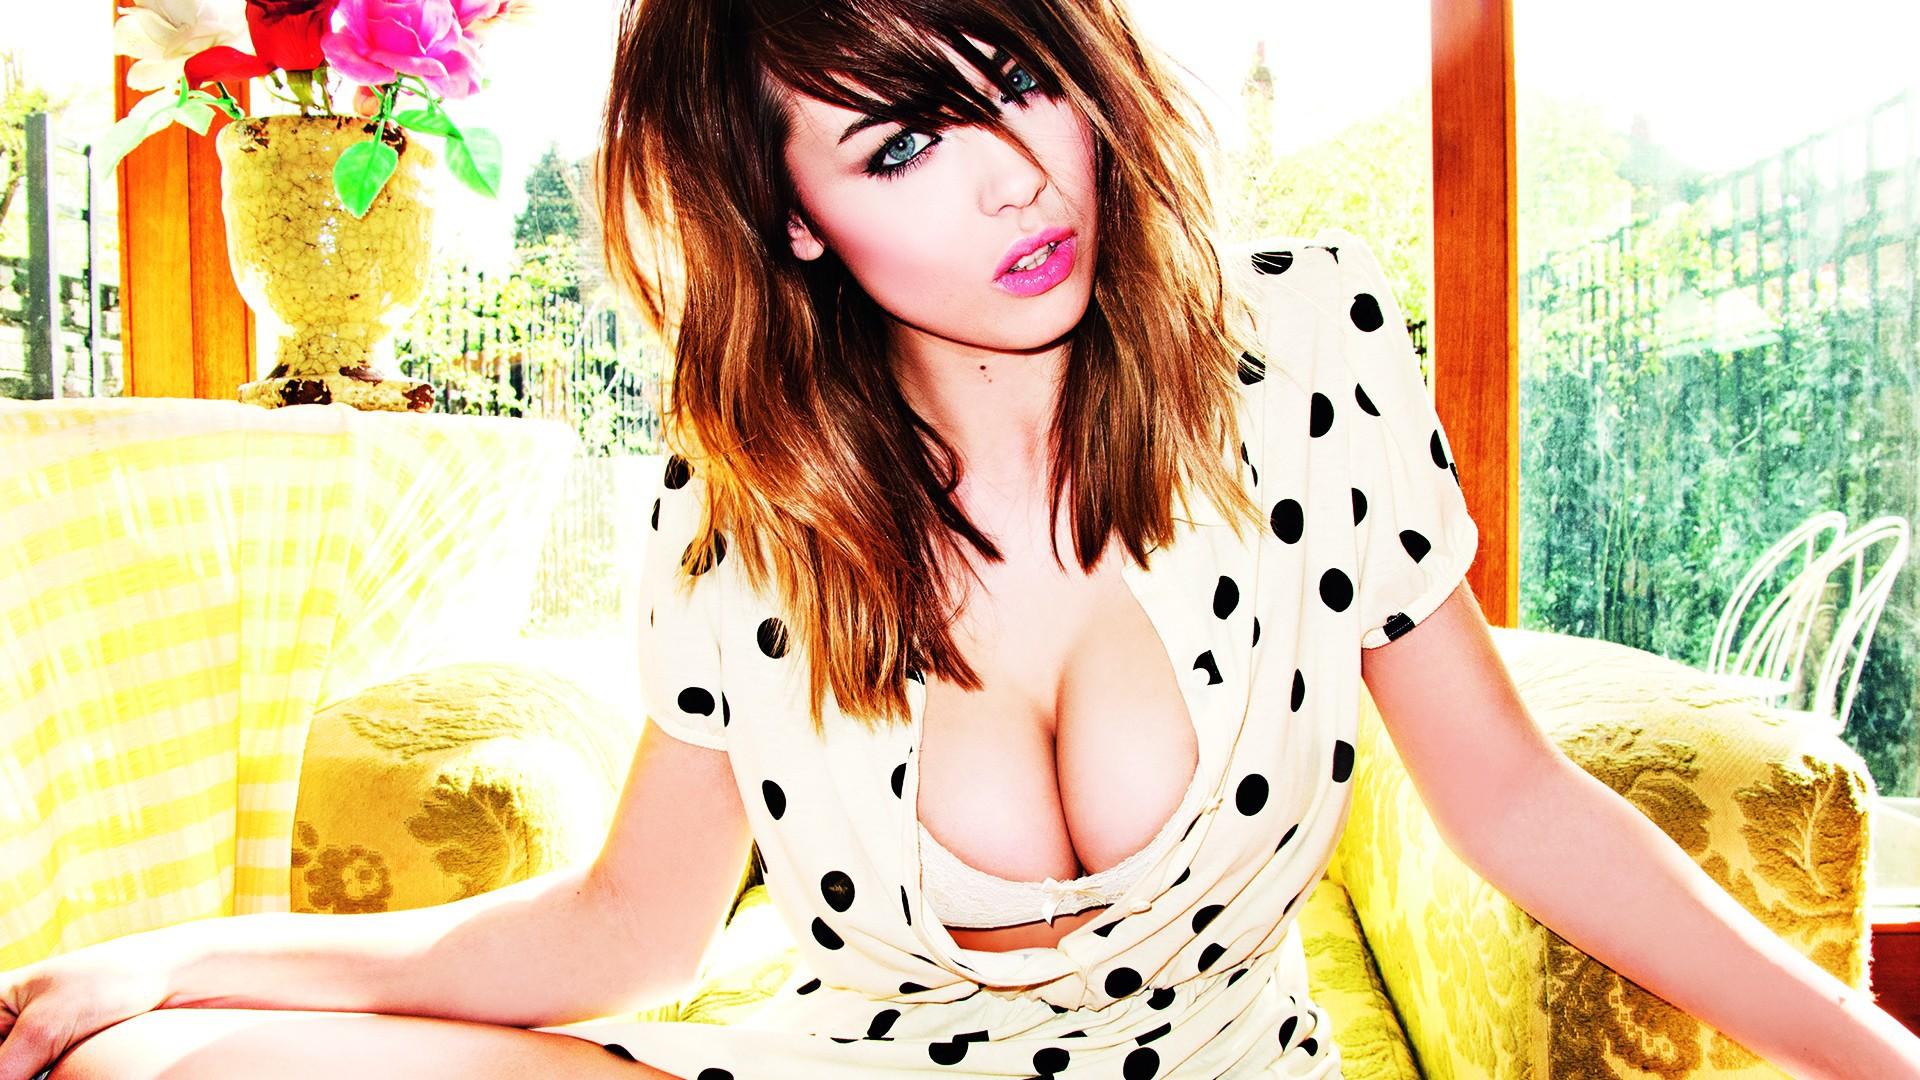 Danielle Sharp Full HD